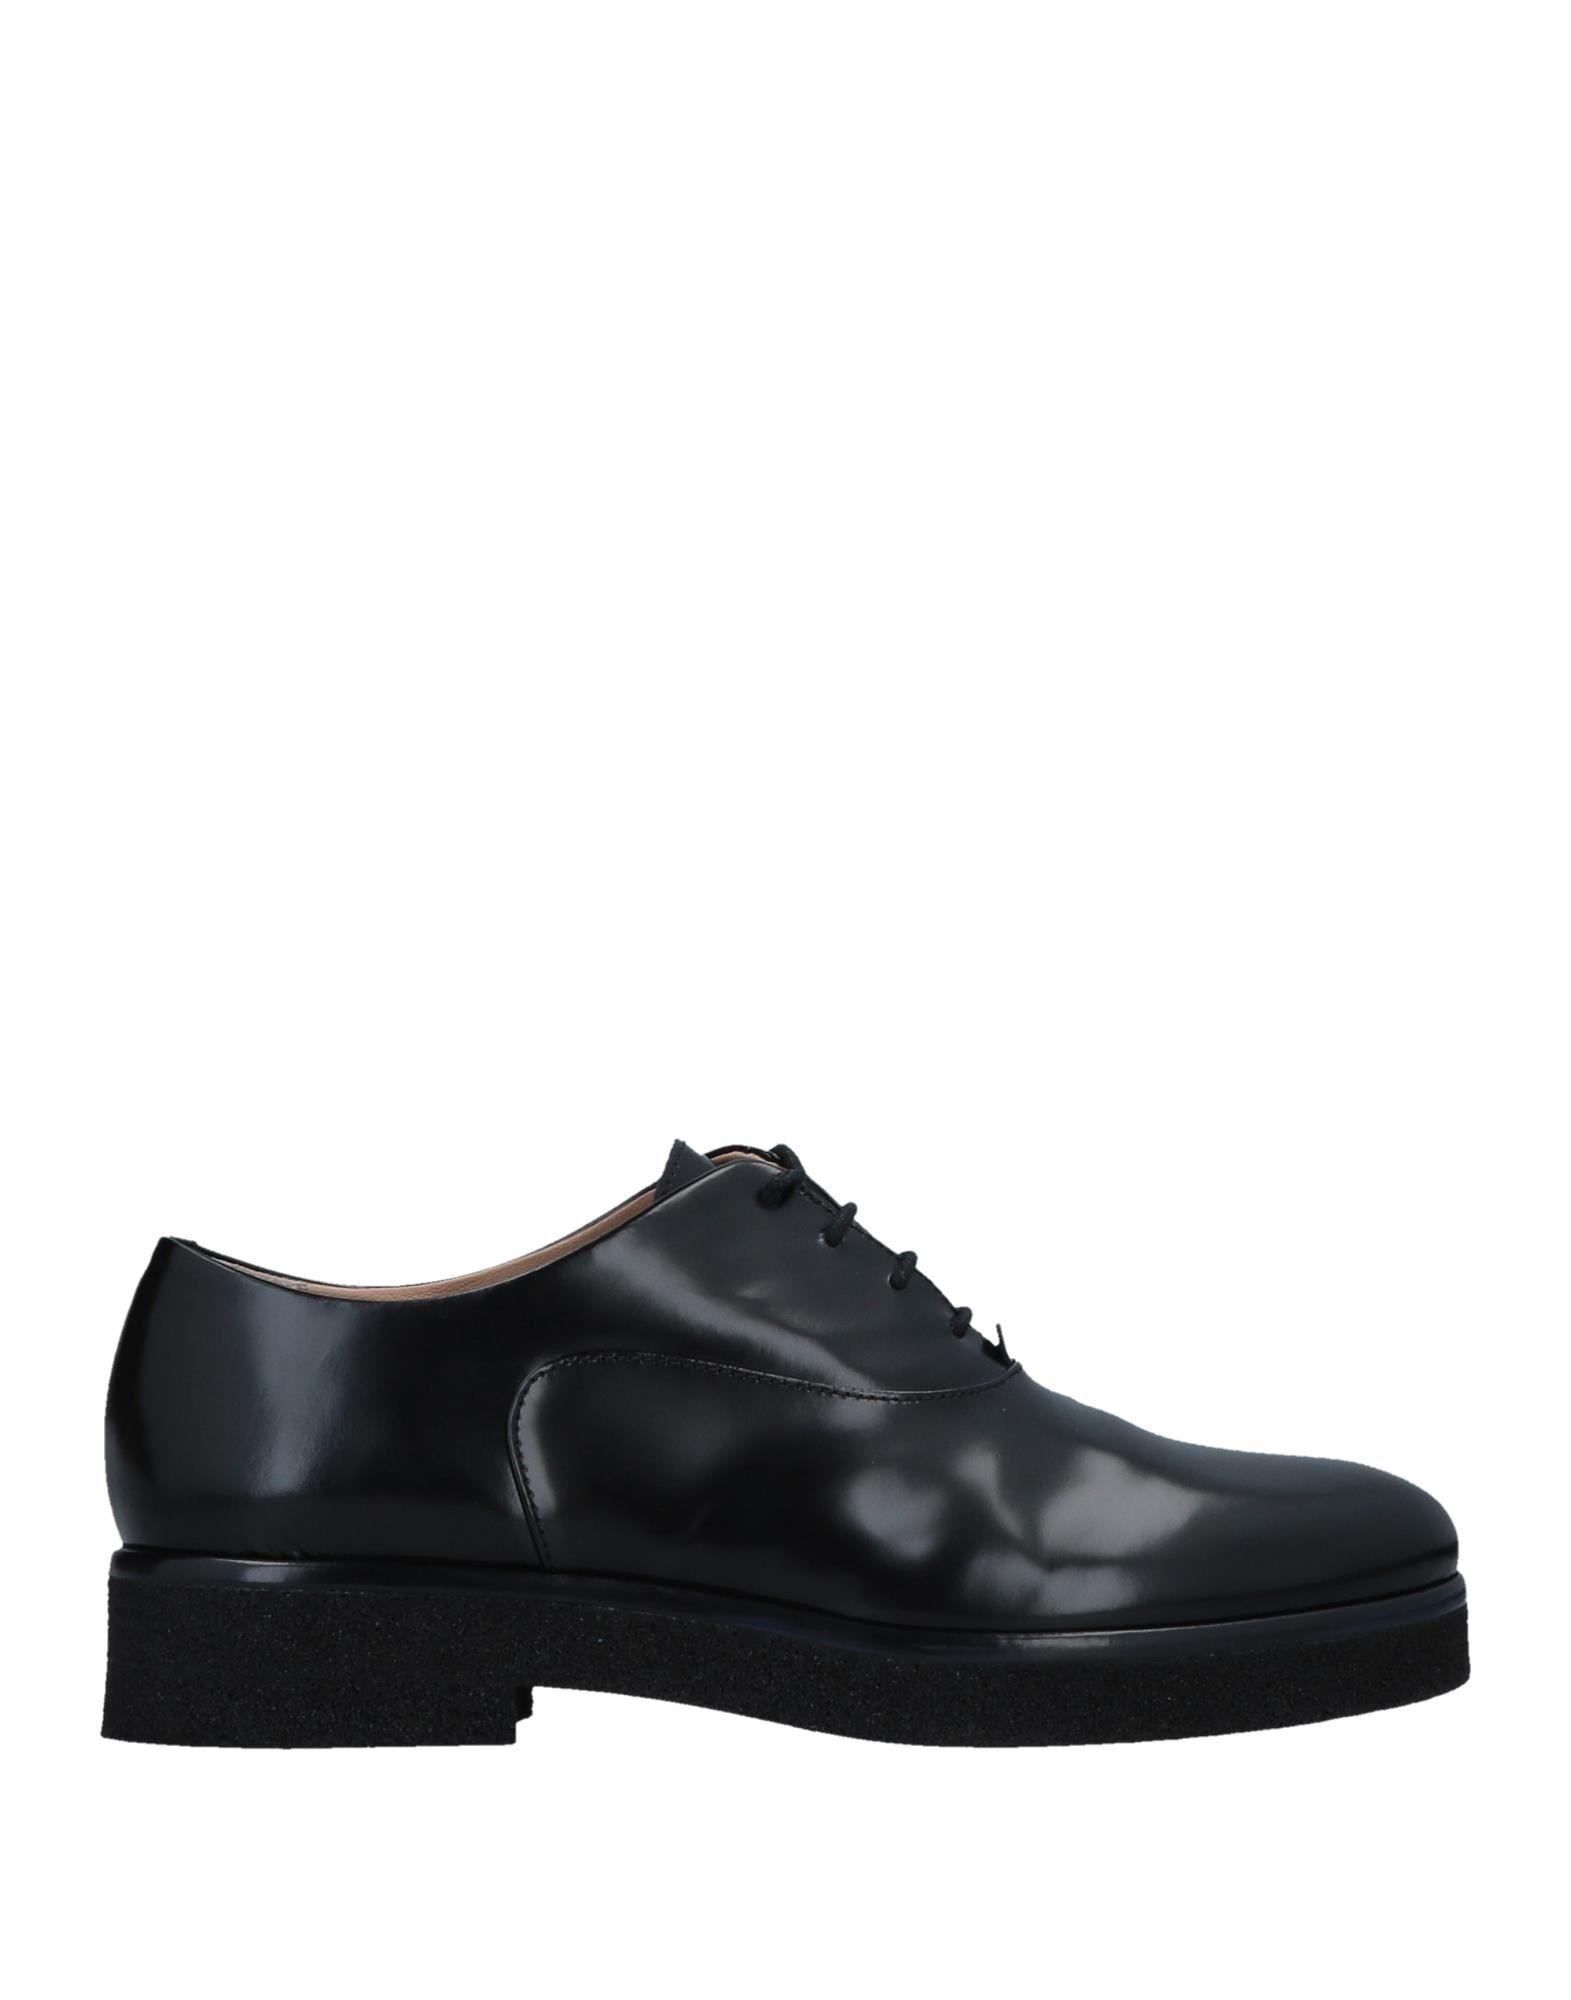 Stilvolle billige Schuhe Pas De Rouge Schnürschuhe Damen  11510769DW